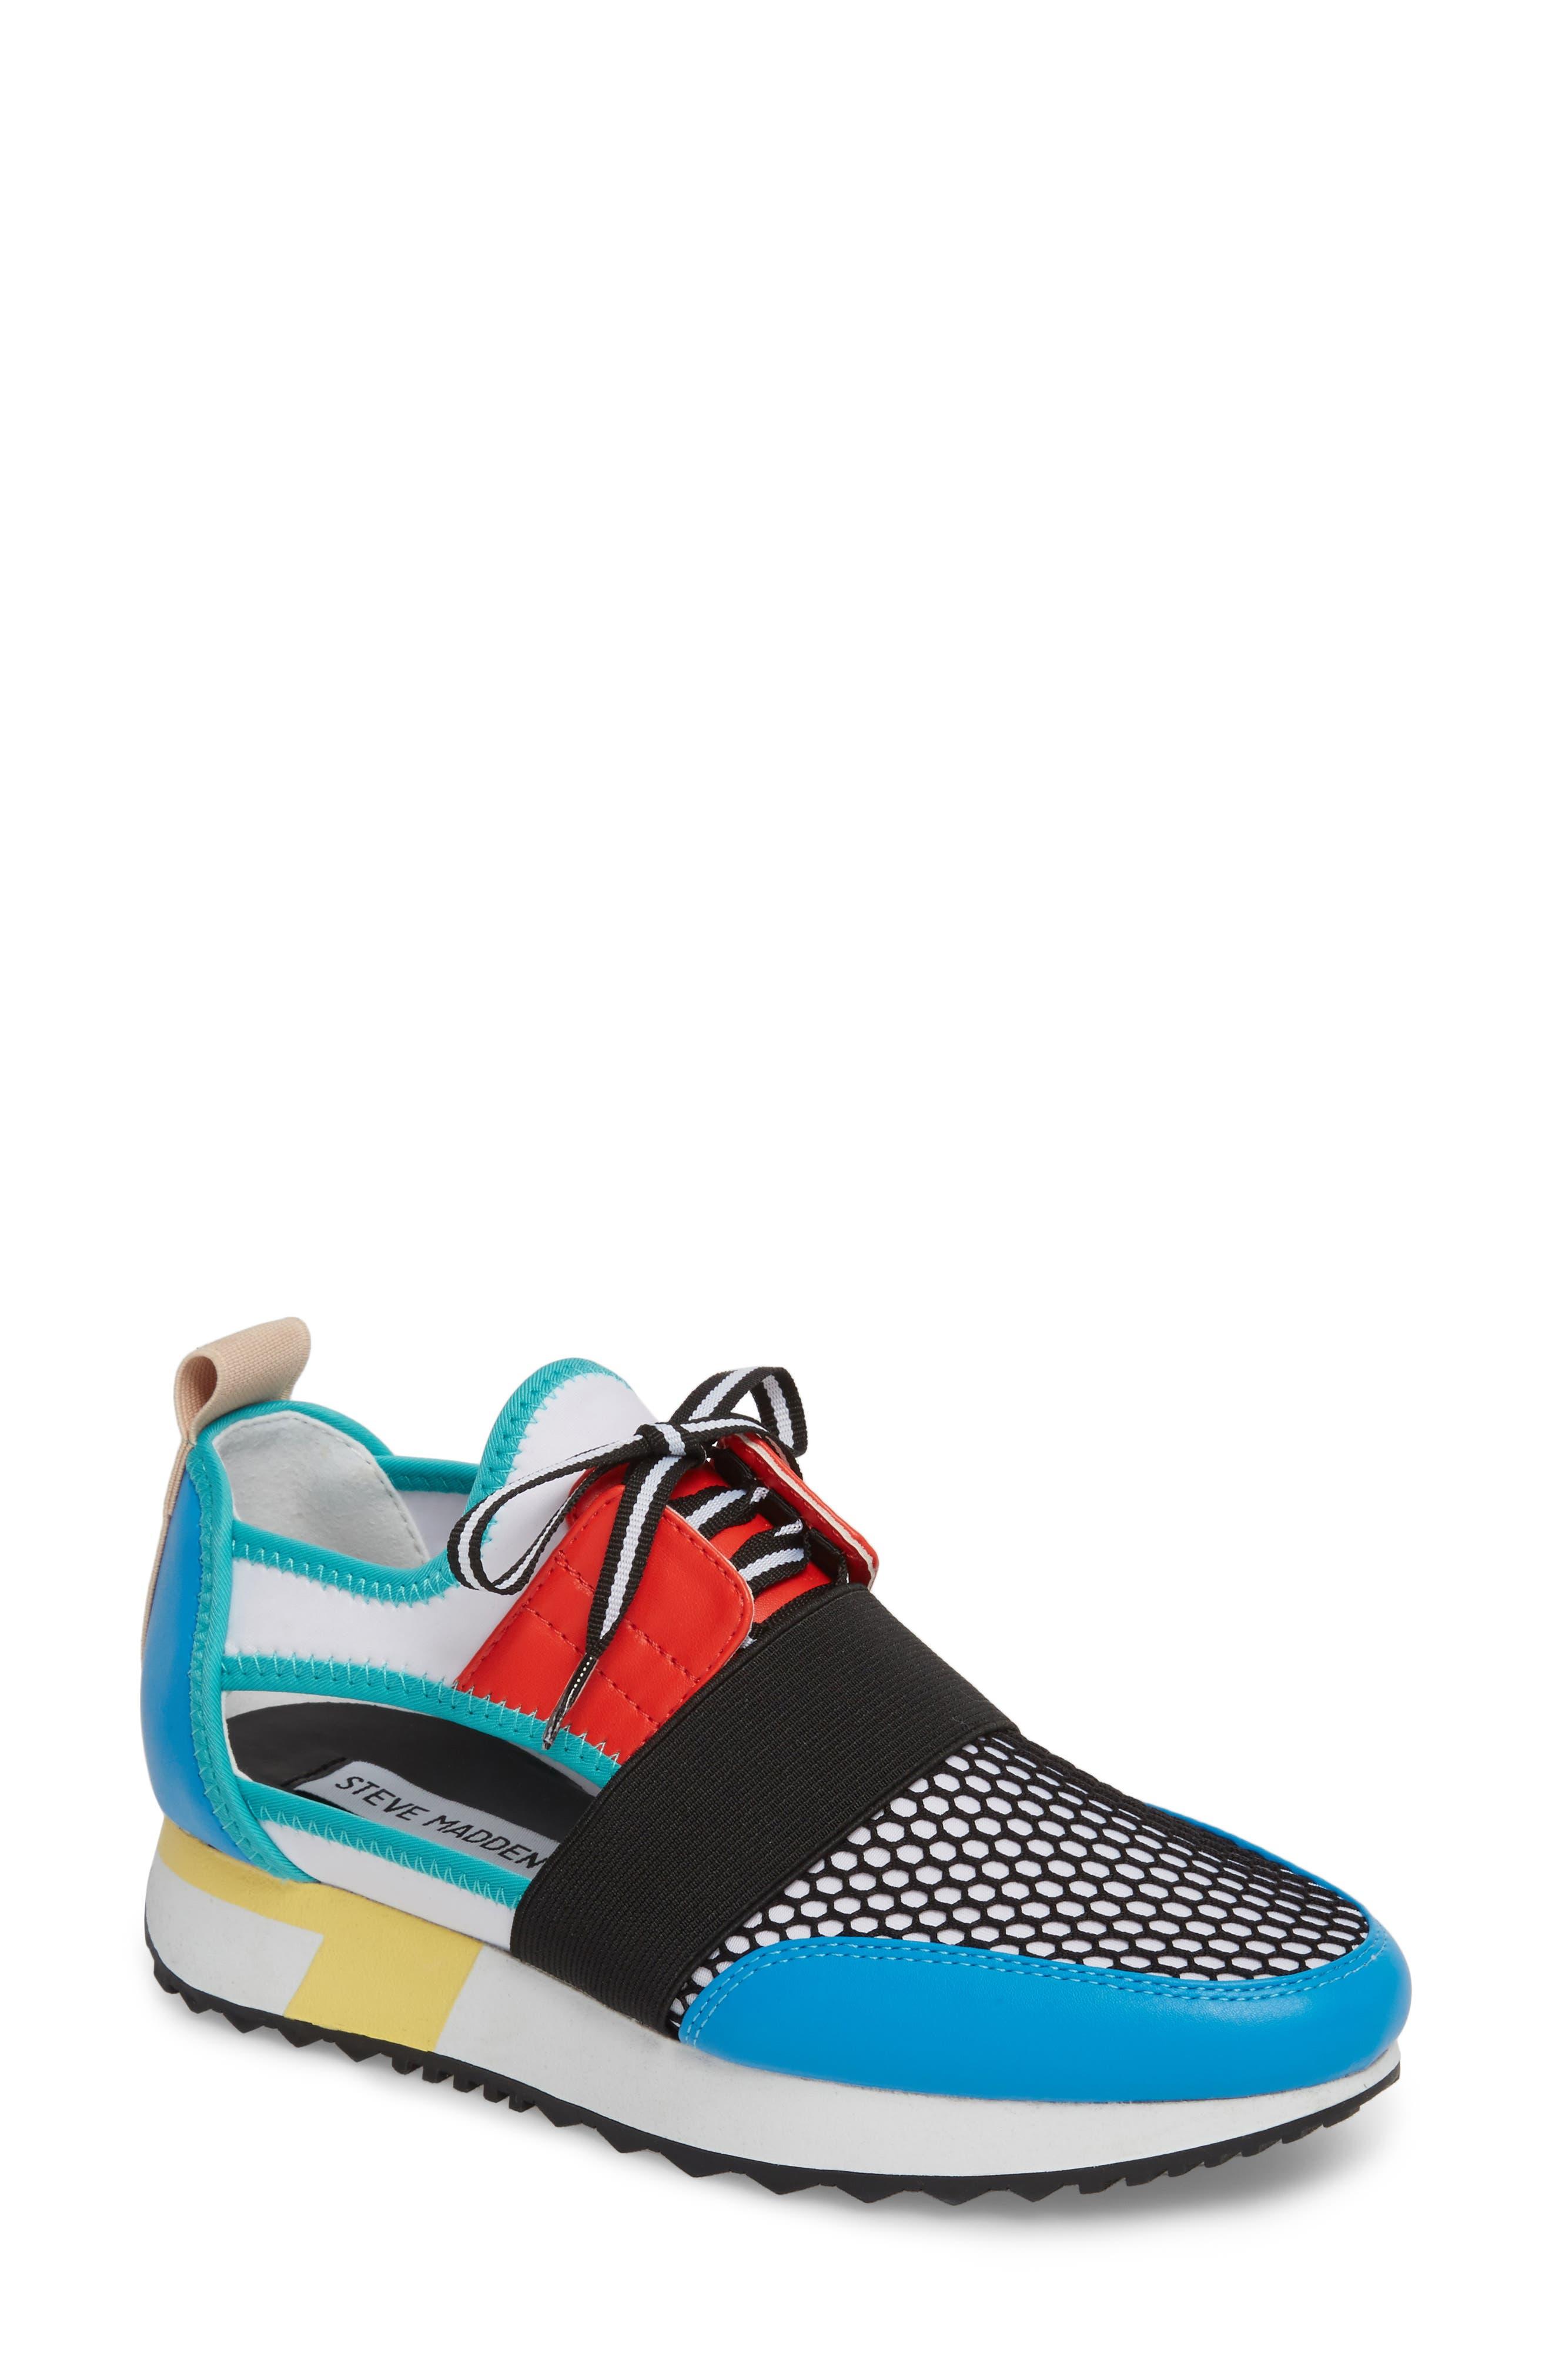 Arctic Sneaker,                             Main thumbnail 1, color,                             Bright Multi